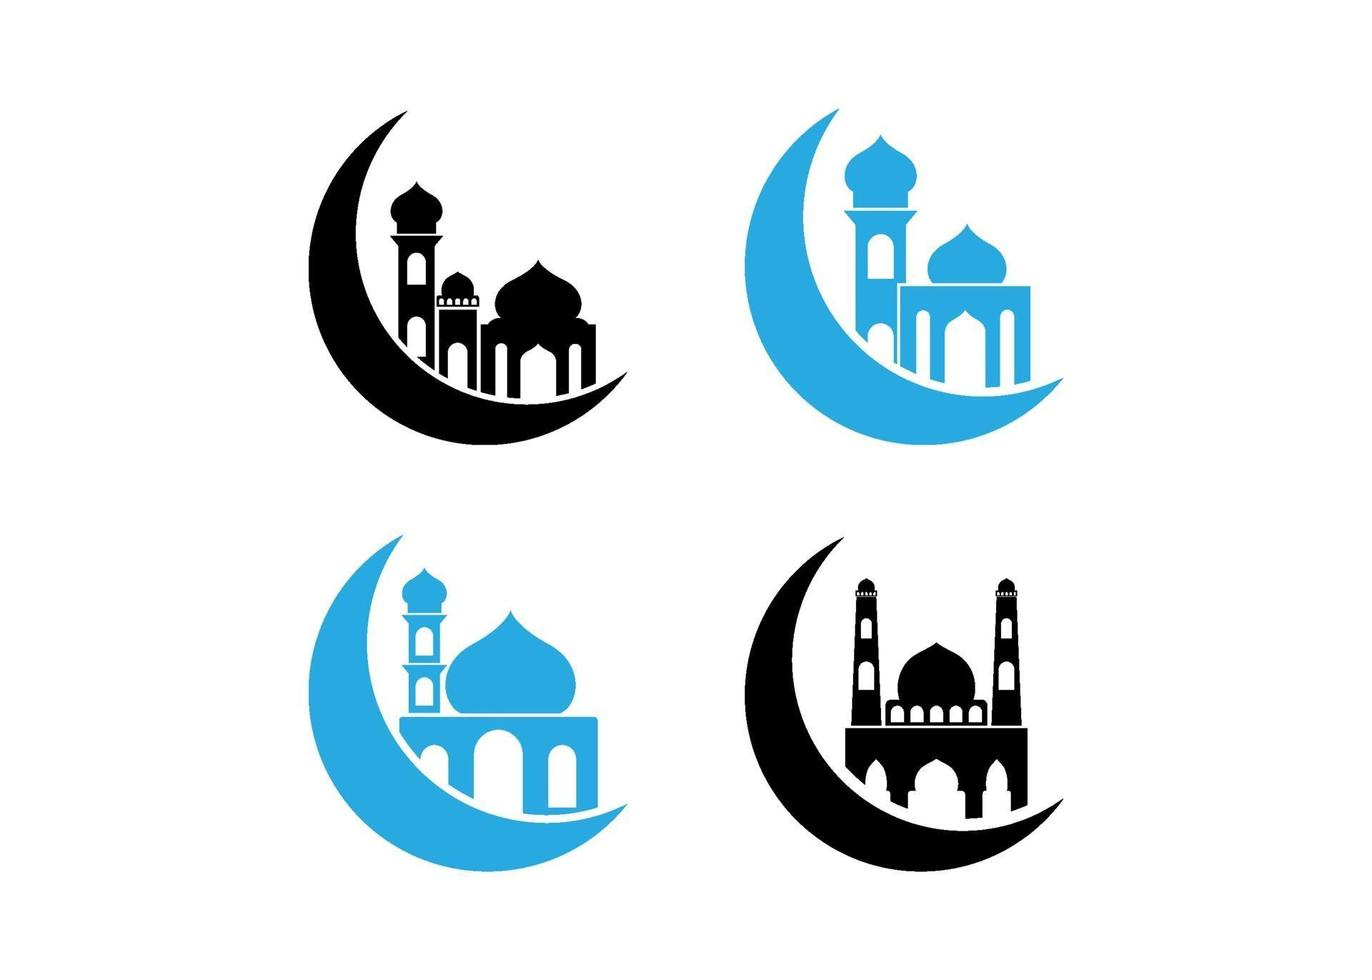 wassende maan moskee pictogram ontwerpsjabloon vector